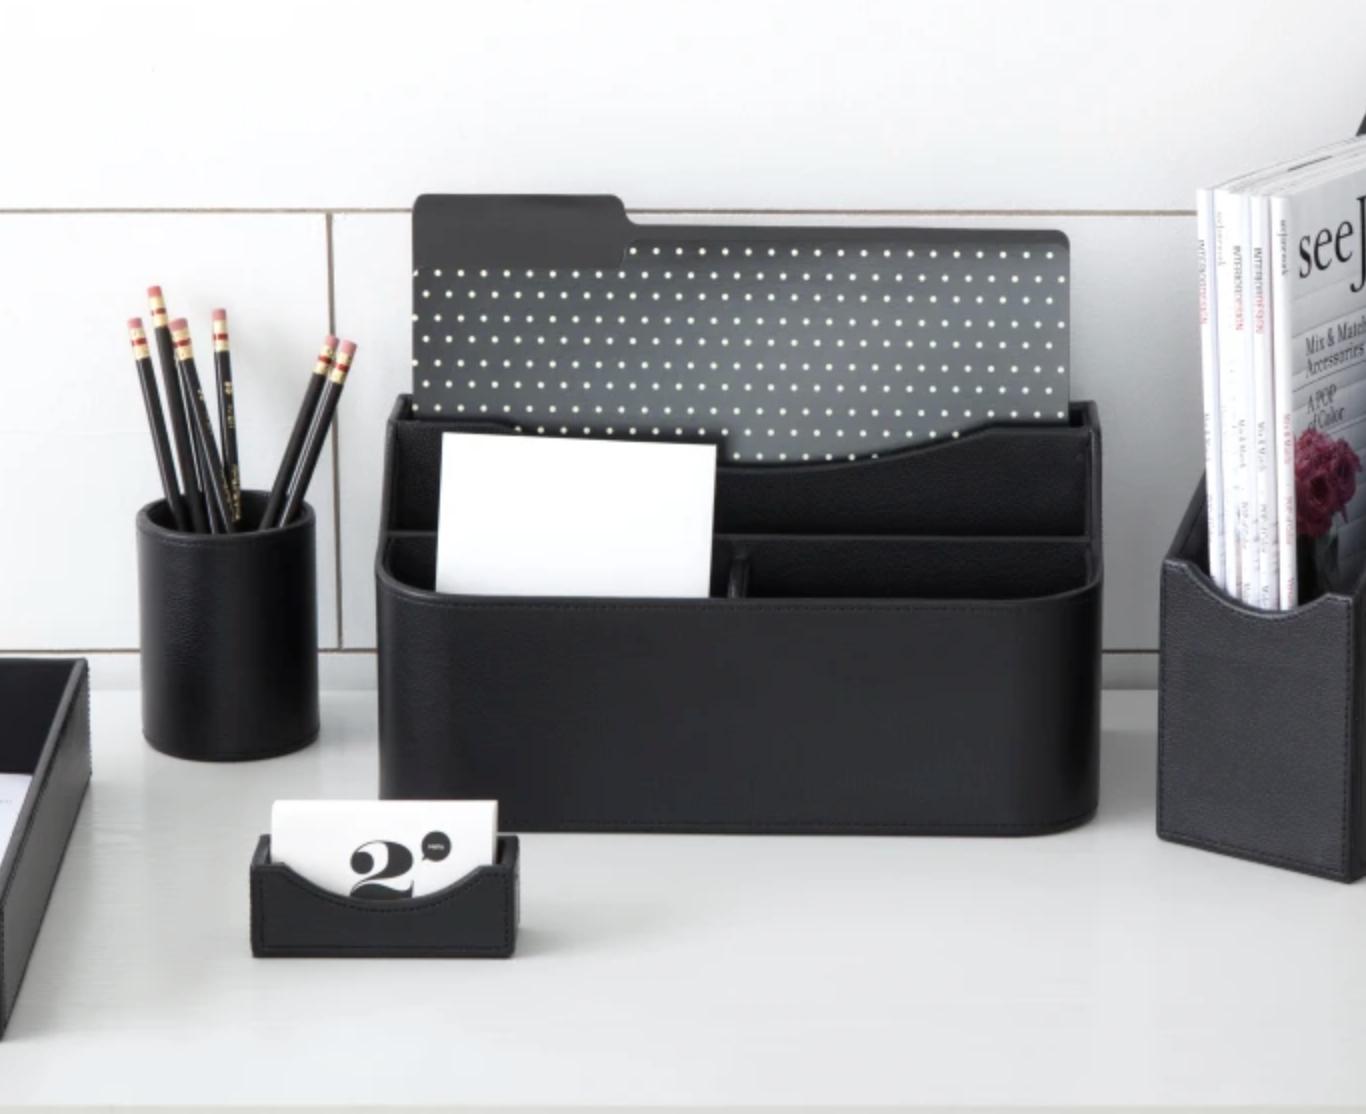 the black desk organizer